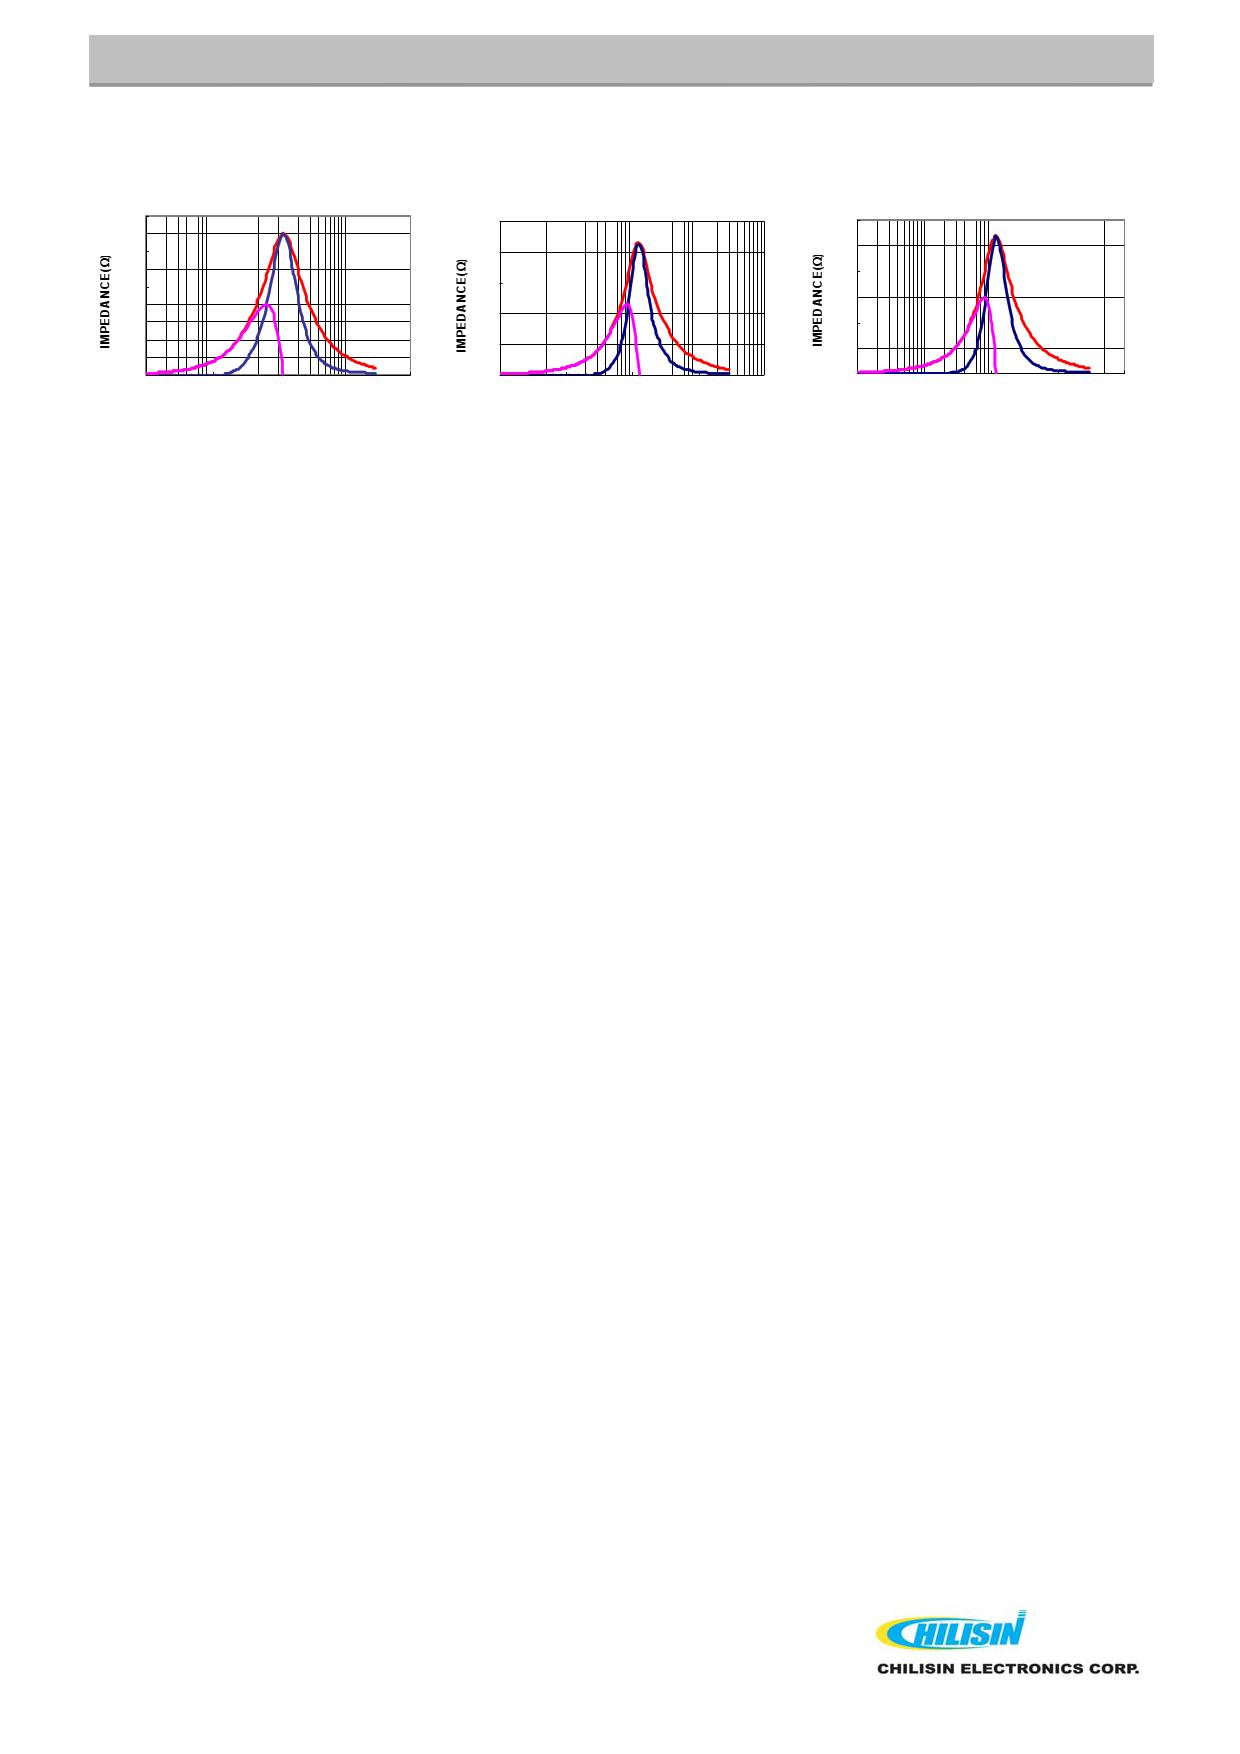 SBJ060303T pdf, 반도체, 판매, 대치품